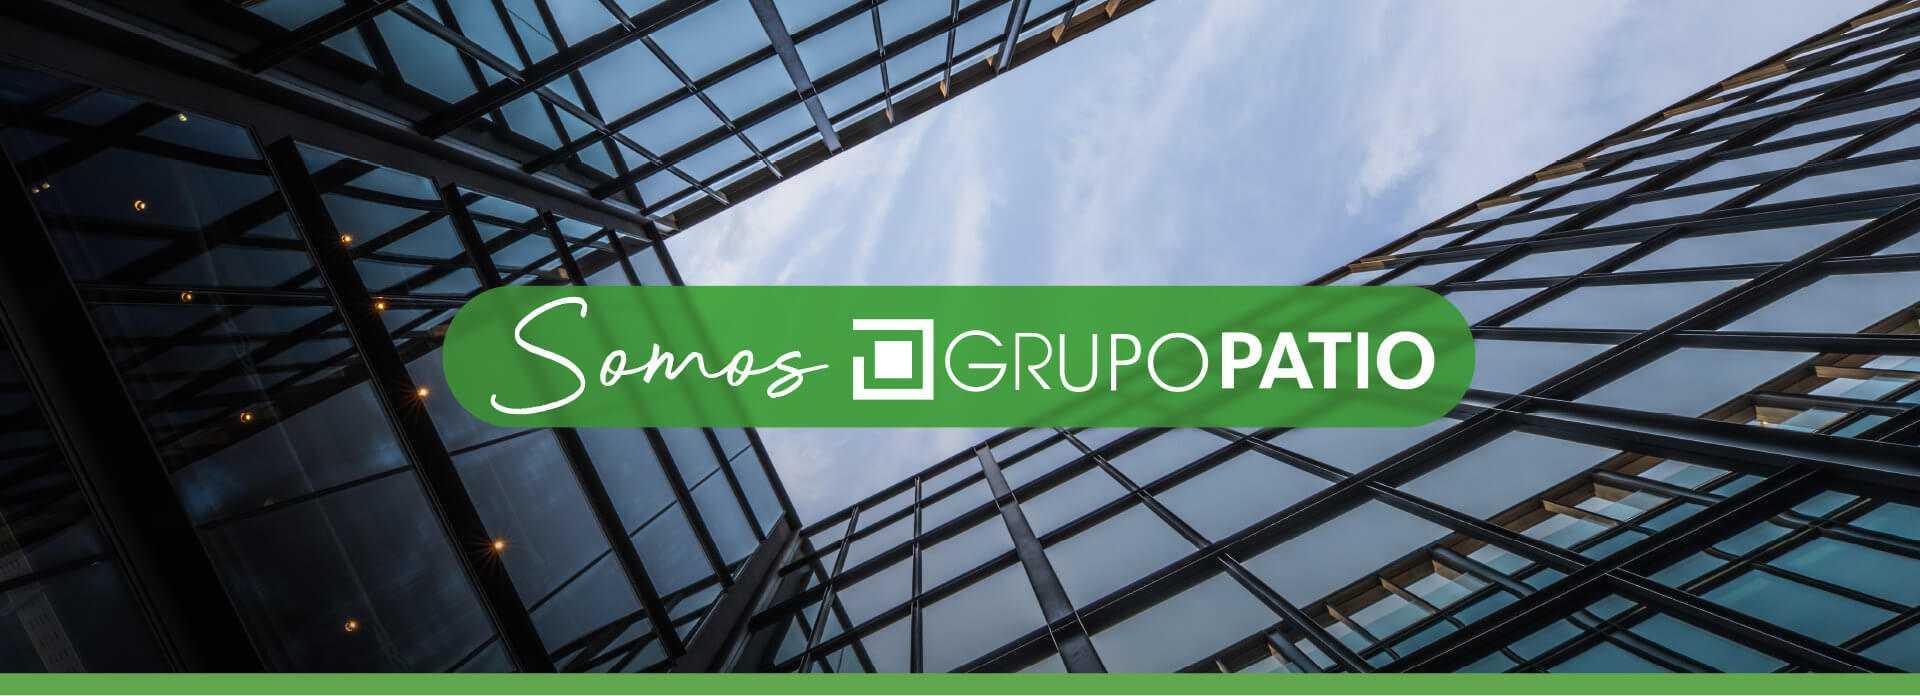 https://www.patio.cl/wp-content/uploads/2020/11/header-somos-grupo-patio.jpg